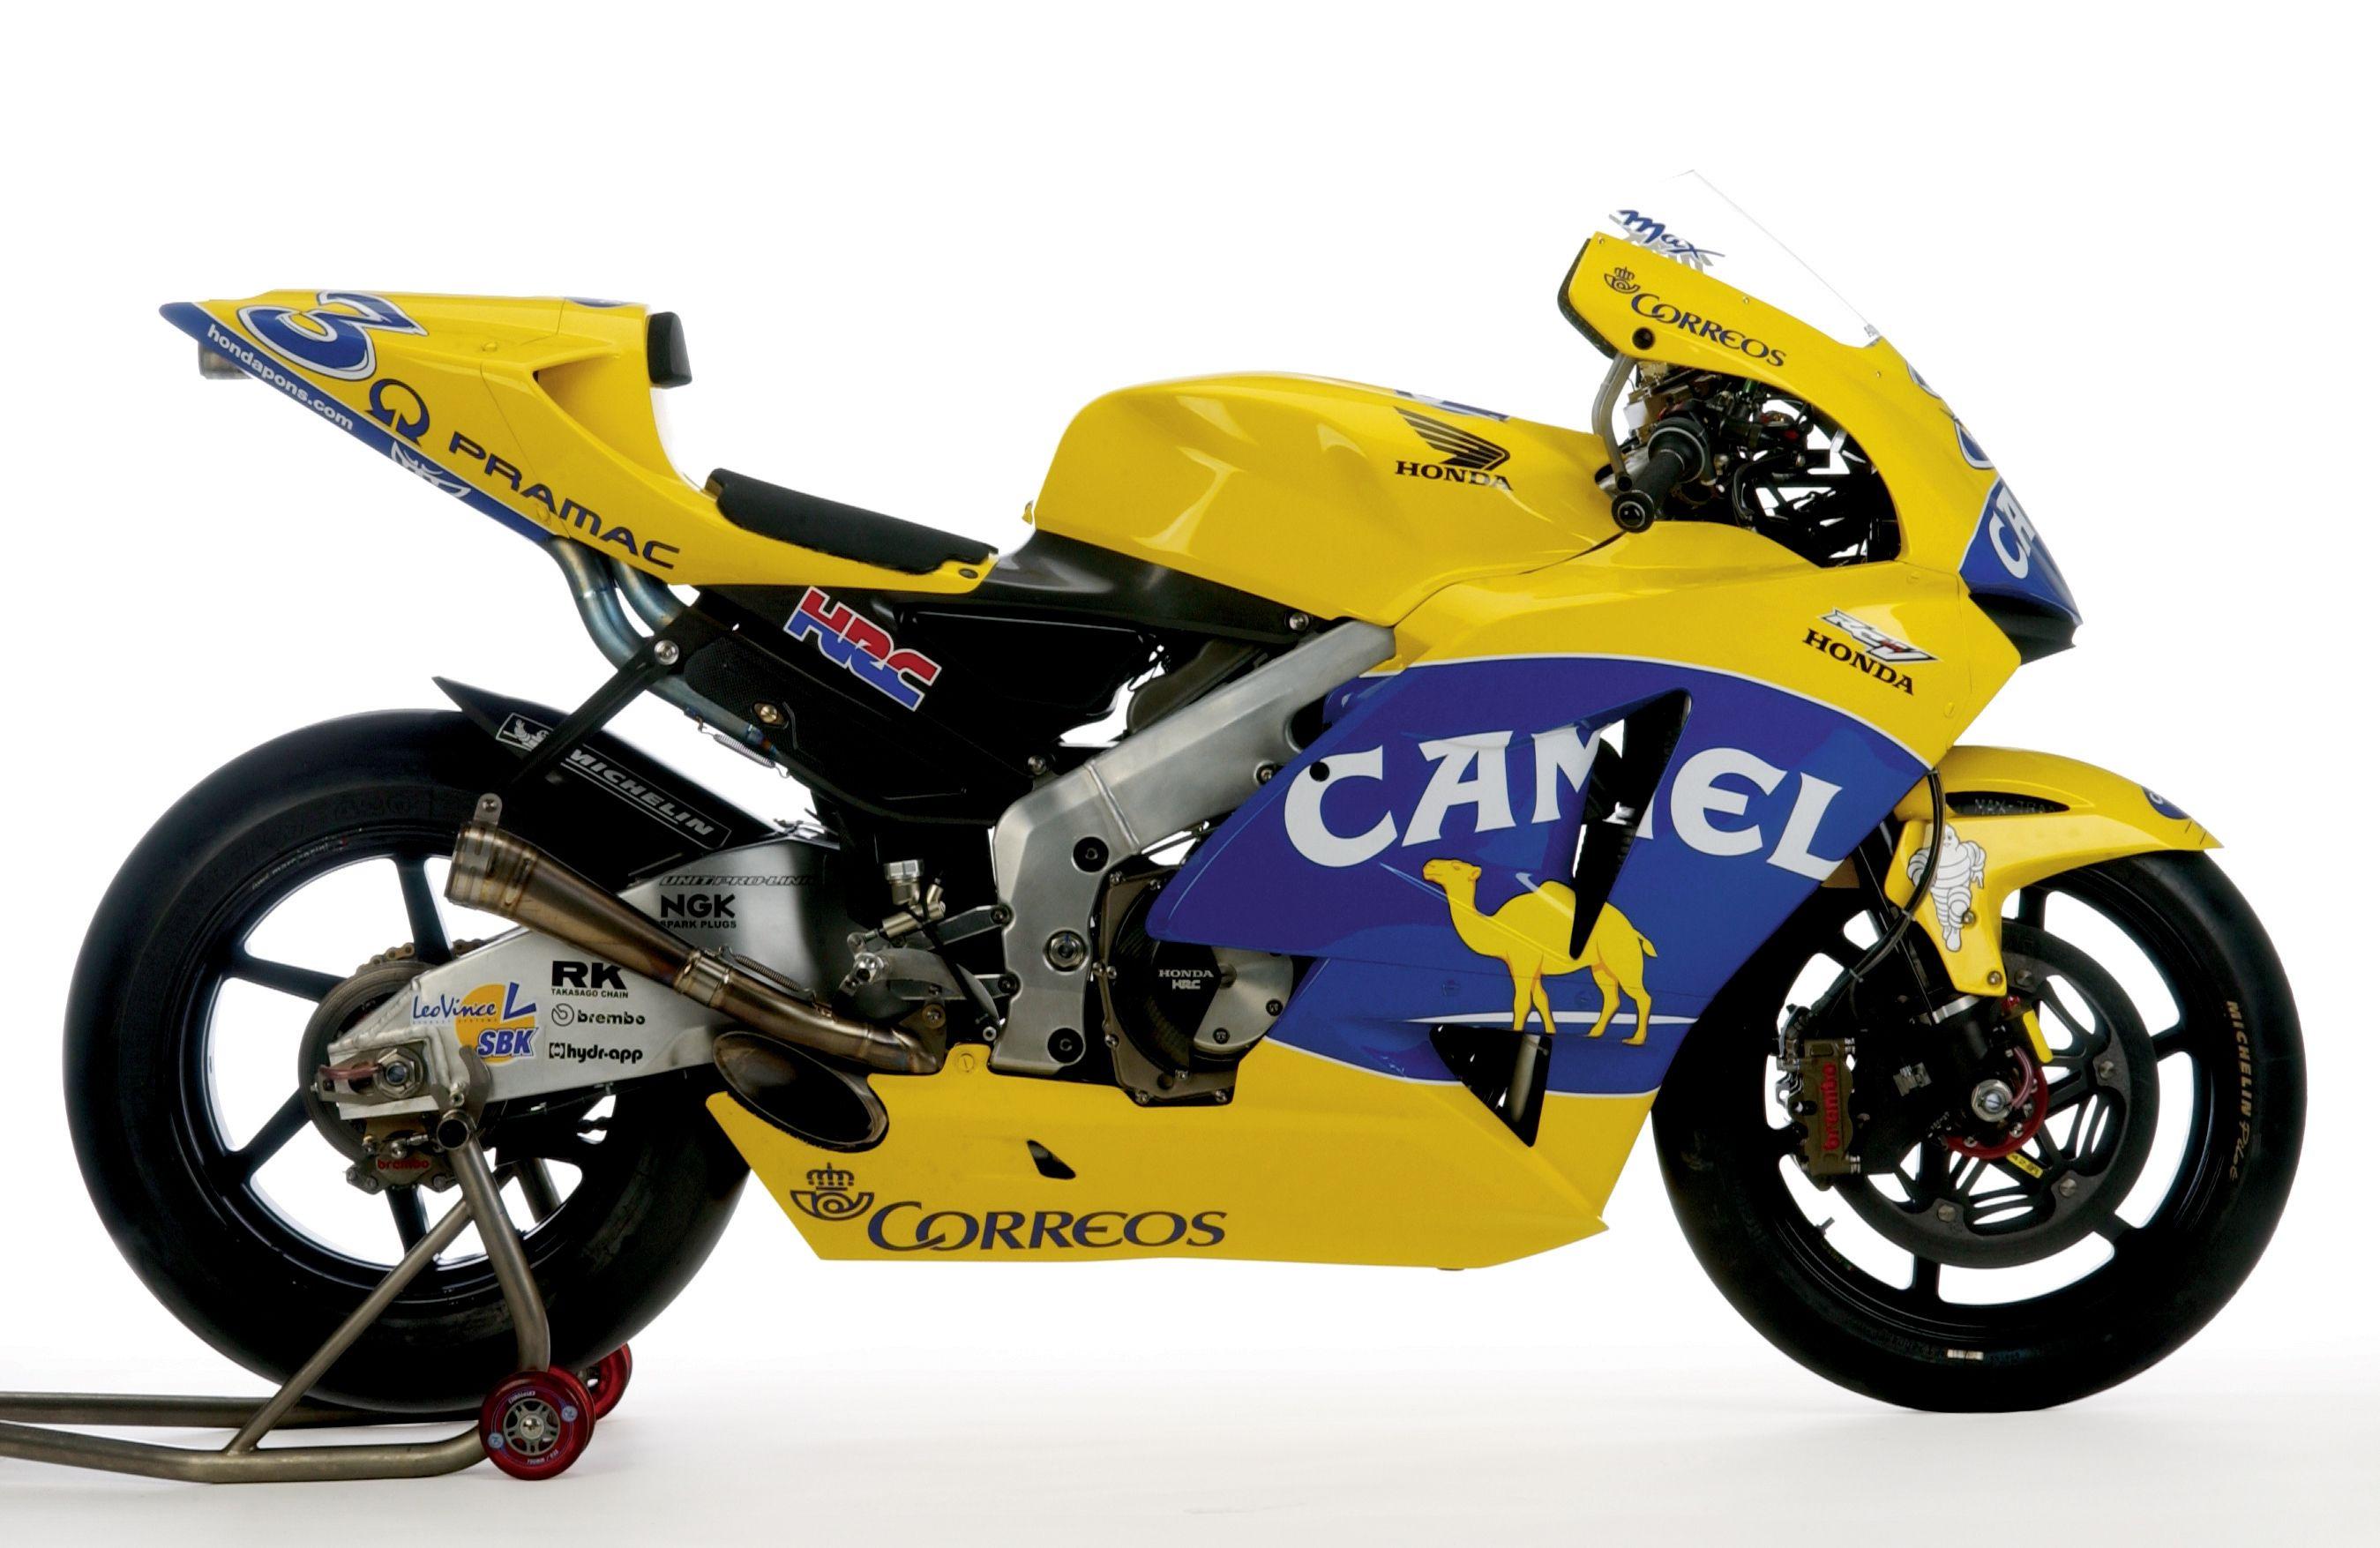 Merveilleux Castrol Honda CBR 1000RR Superbike | Motorcycles | Pinterest | Honda Cbr  1000rr, Cbr And Honda